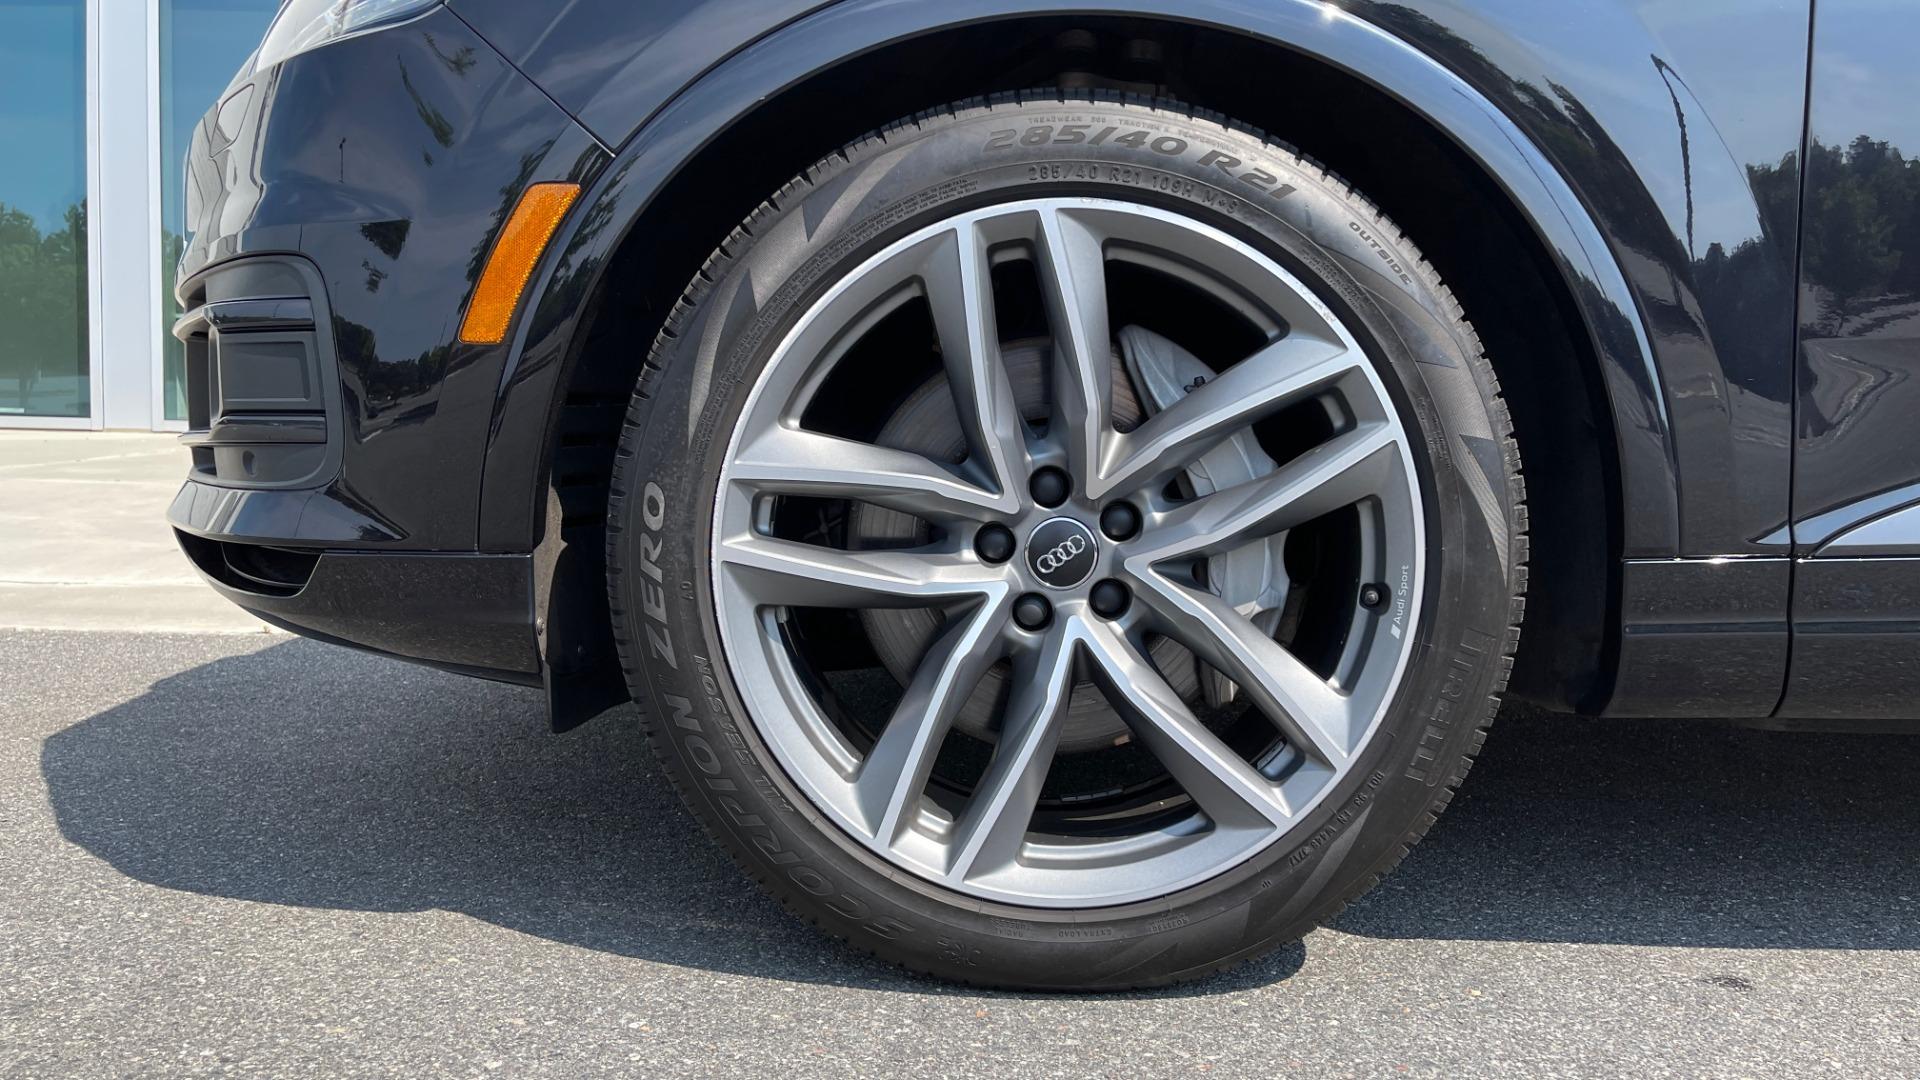 Used 2018 Audi Q7 PRESTIGE TIPTRONIC / NAV / SUNROOF / ADAPTIVE PKG / DRVR ASST / CLD WTHR /  for sale $49,995 at Formula Imports in Charlotte NC 28227 74